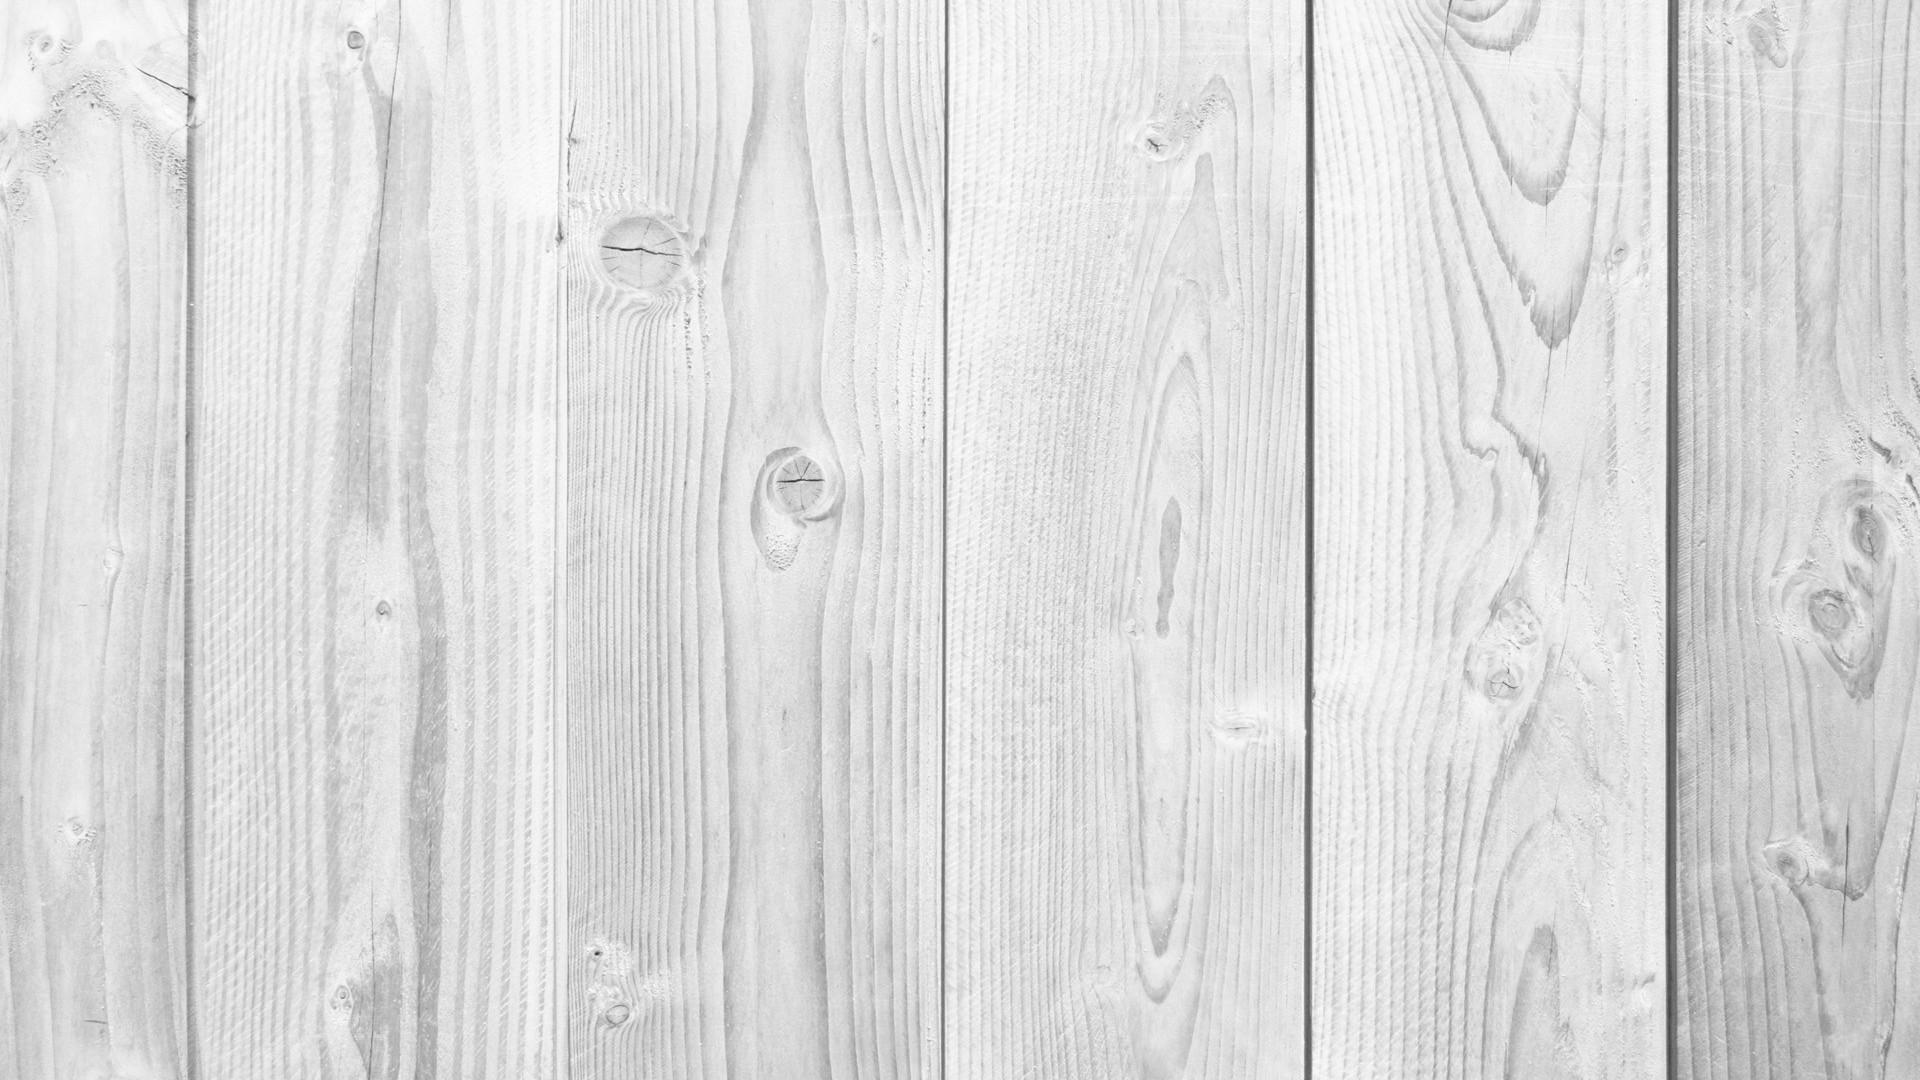 … Light Rustic Wood Background